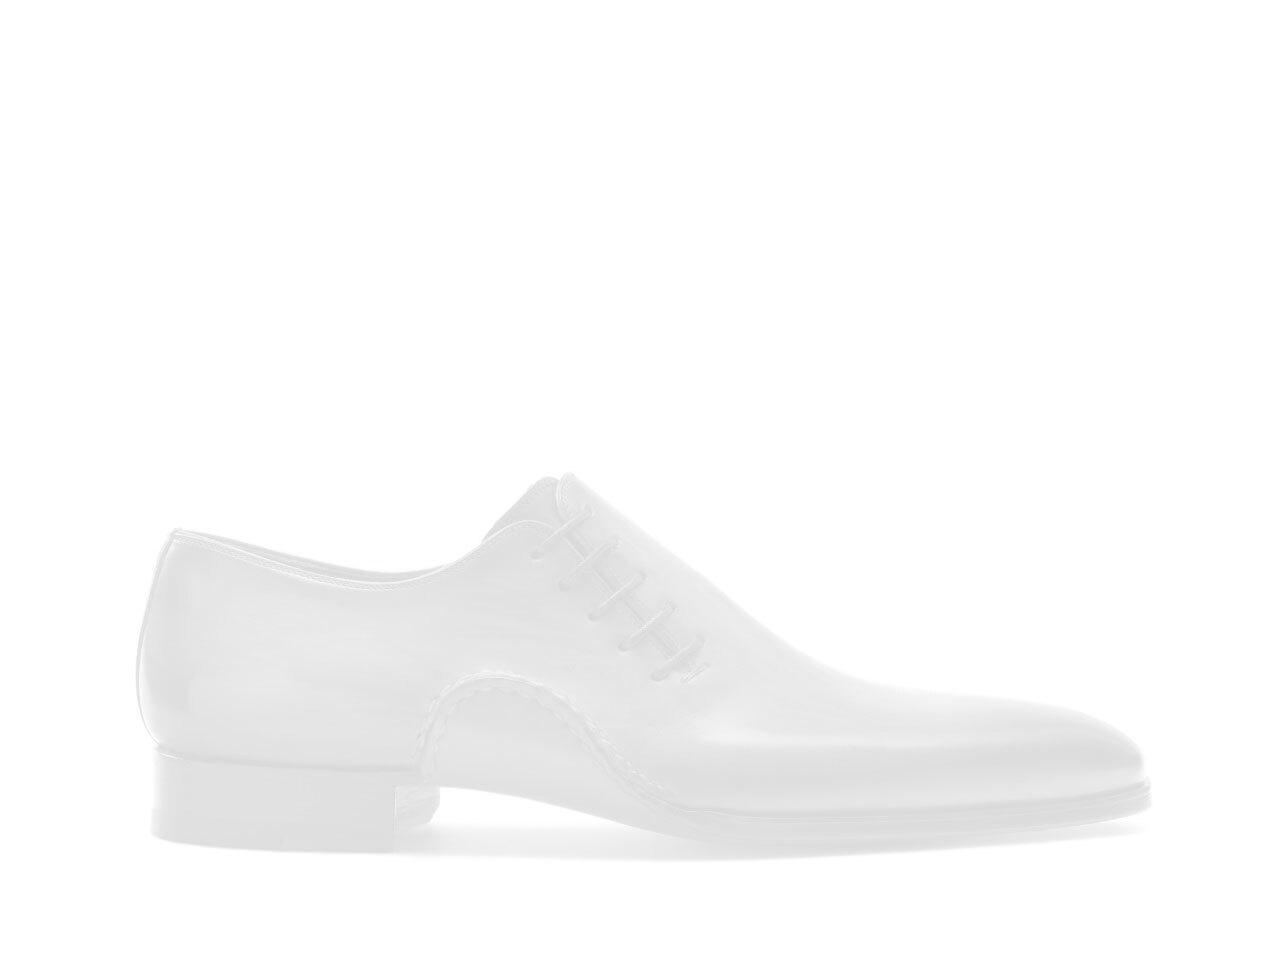 Black hand finished calfskin single buckle monk strap shoes for men - Magnanni